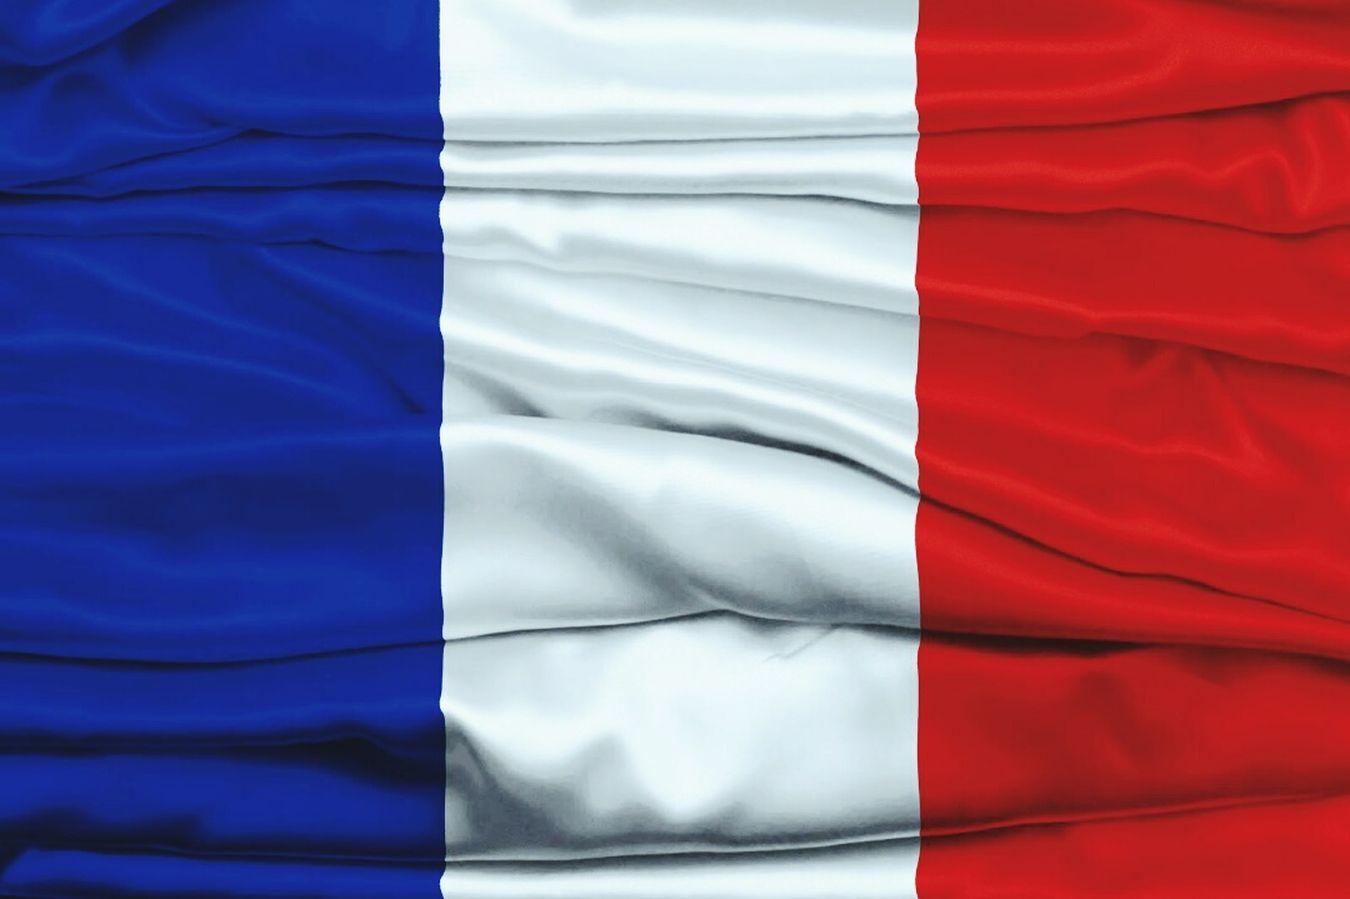 Trikolore France Liberte Egalite Fraternite Thinking About You